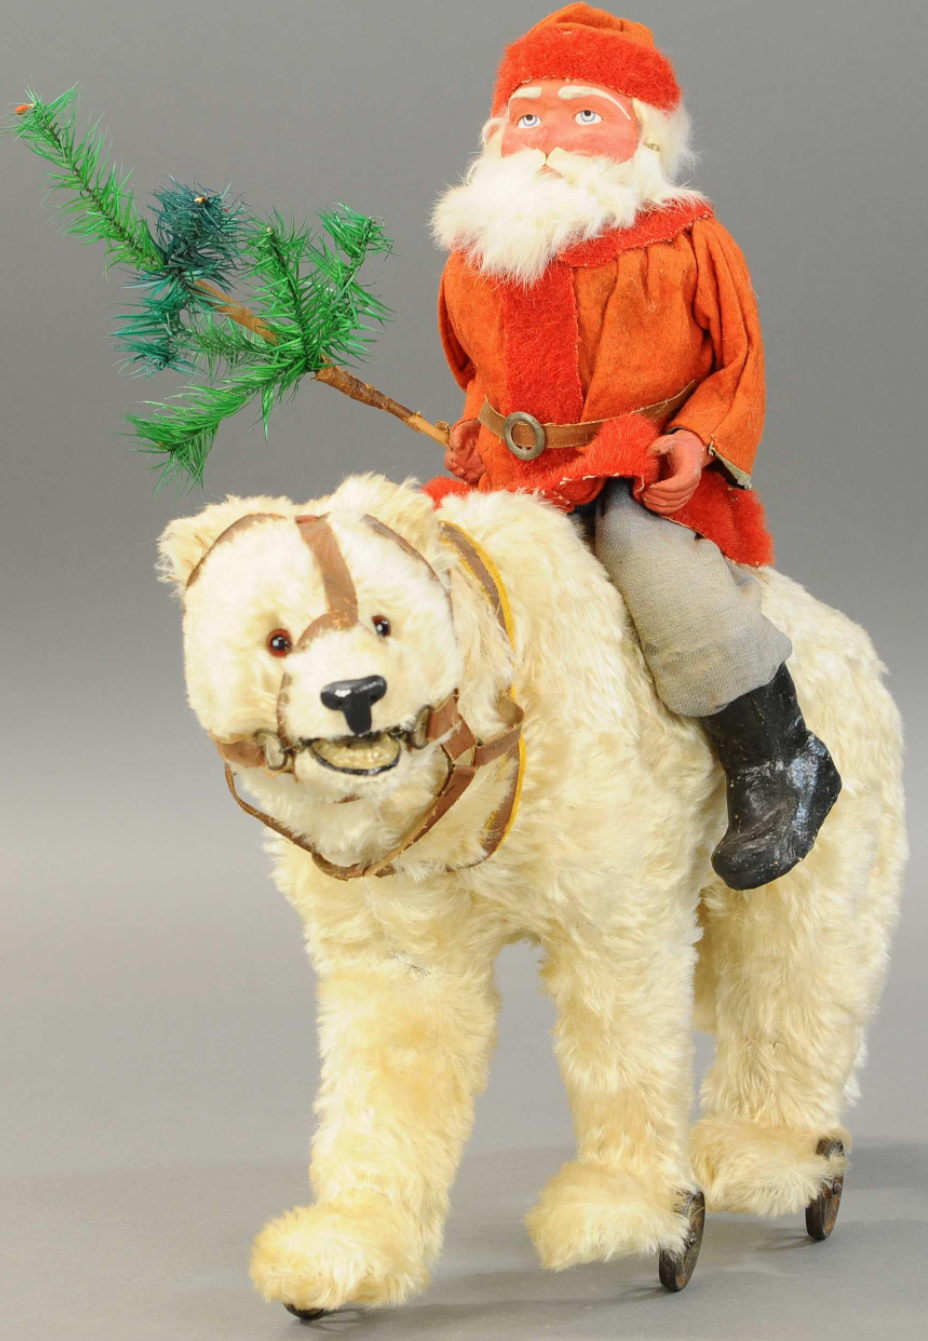 Santa on a growling polar bear. Photo courtesy of Bertoia Auctions of Vineland, NJ.